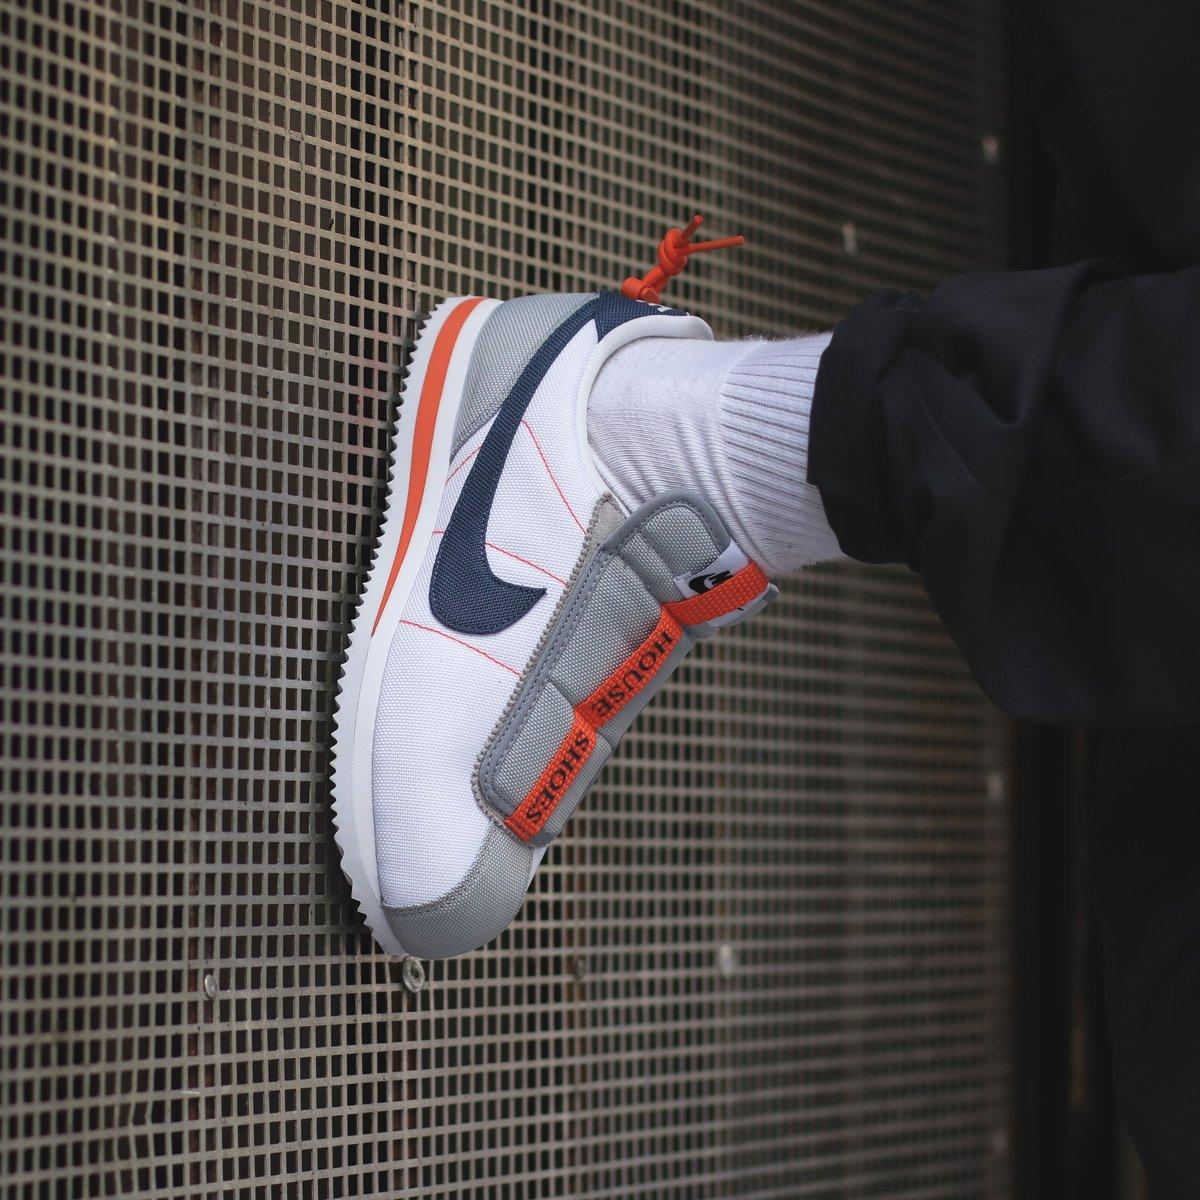 new concept 6b299 e0874 Kendrick Lamar x Nike Cortez Basic Slip -  House Shoes  Sizes available  online at Allike http   tinyurl.com ydc4b5ug  18montrose http   tinyurl.com yat7b6df ...